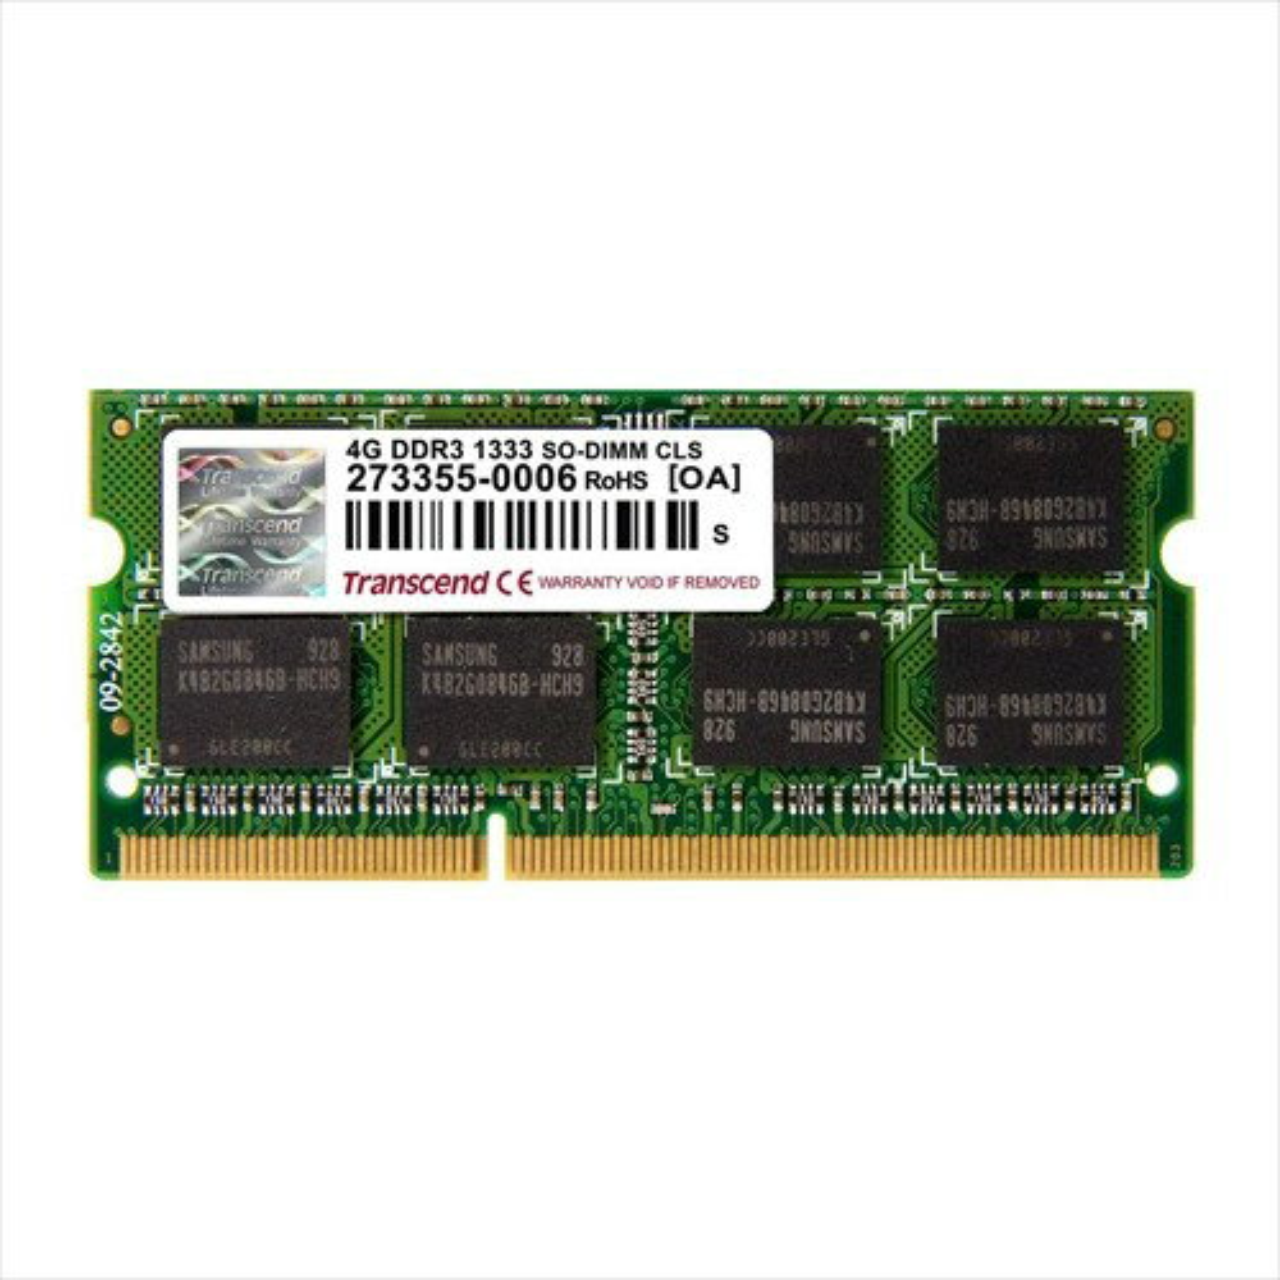 Transcend 増設メモリ 4GB ノートPC用 DDR3-1333 PC3-10600 SO-DIMM PCメモリ メモリーモジュール[TS512MSK64V3N]【ネコポス対応】【楽天BOX受取対象商品】【送料無料】